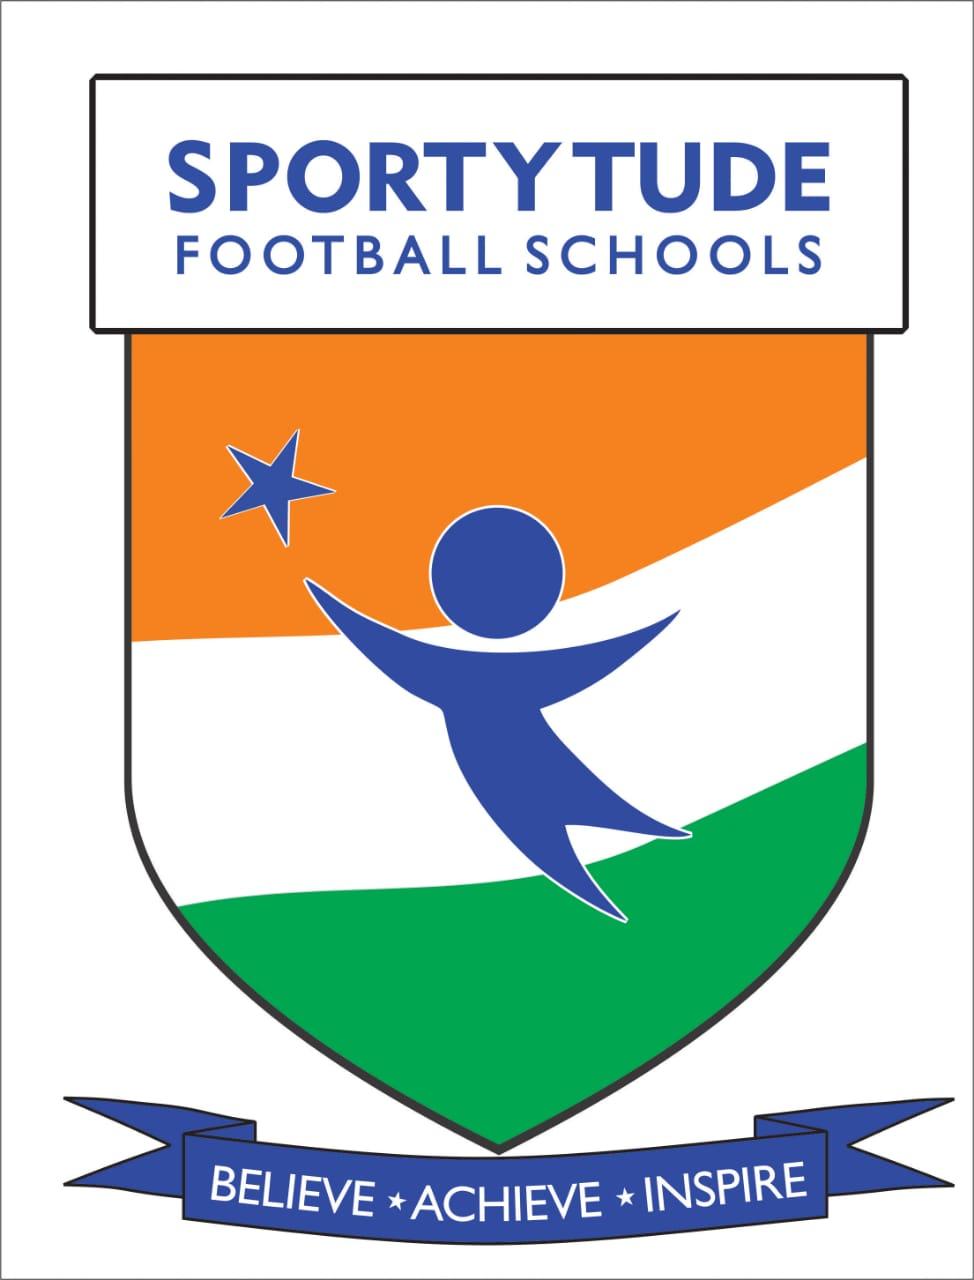 THE SPORTYTUDE FOOTBALL SCHOOL